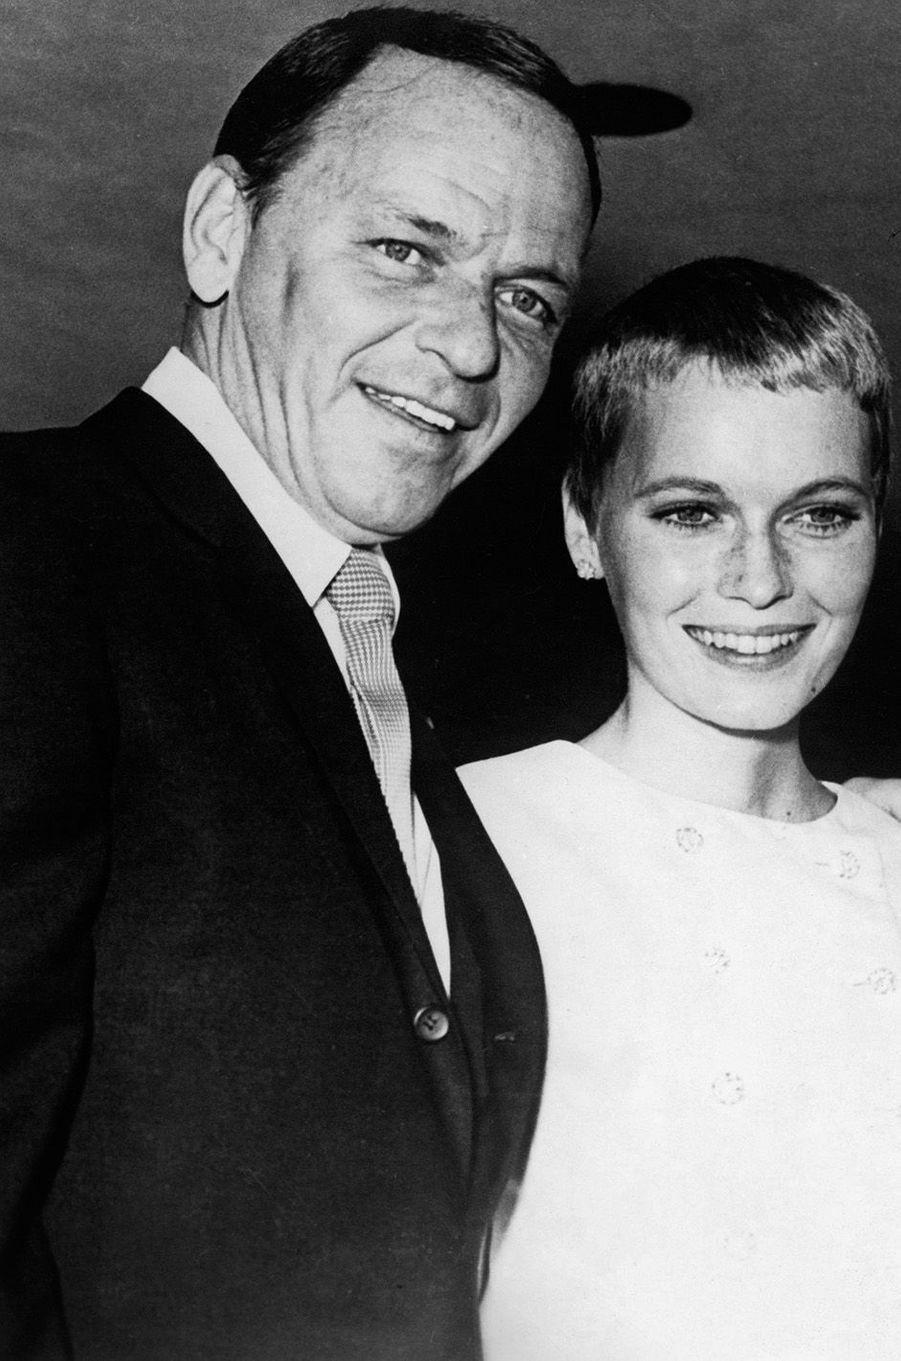 Frank Sinatra et Mia Farrow lors de leur mariage à Vegas, 1966